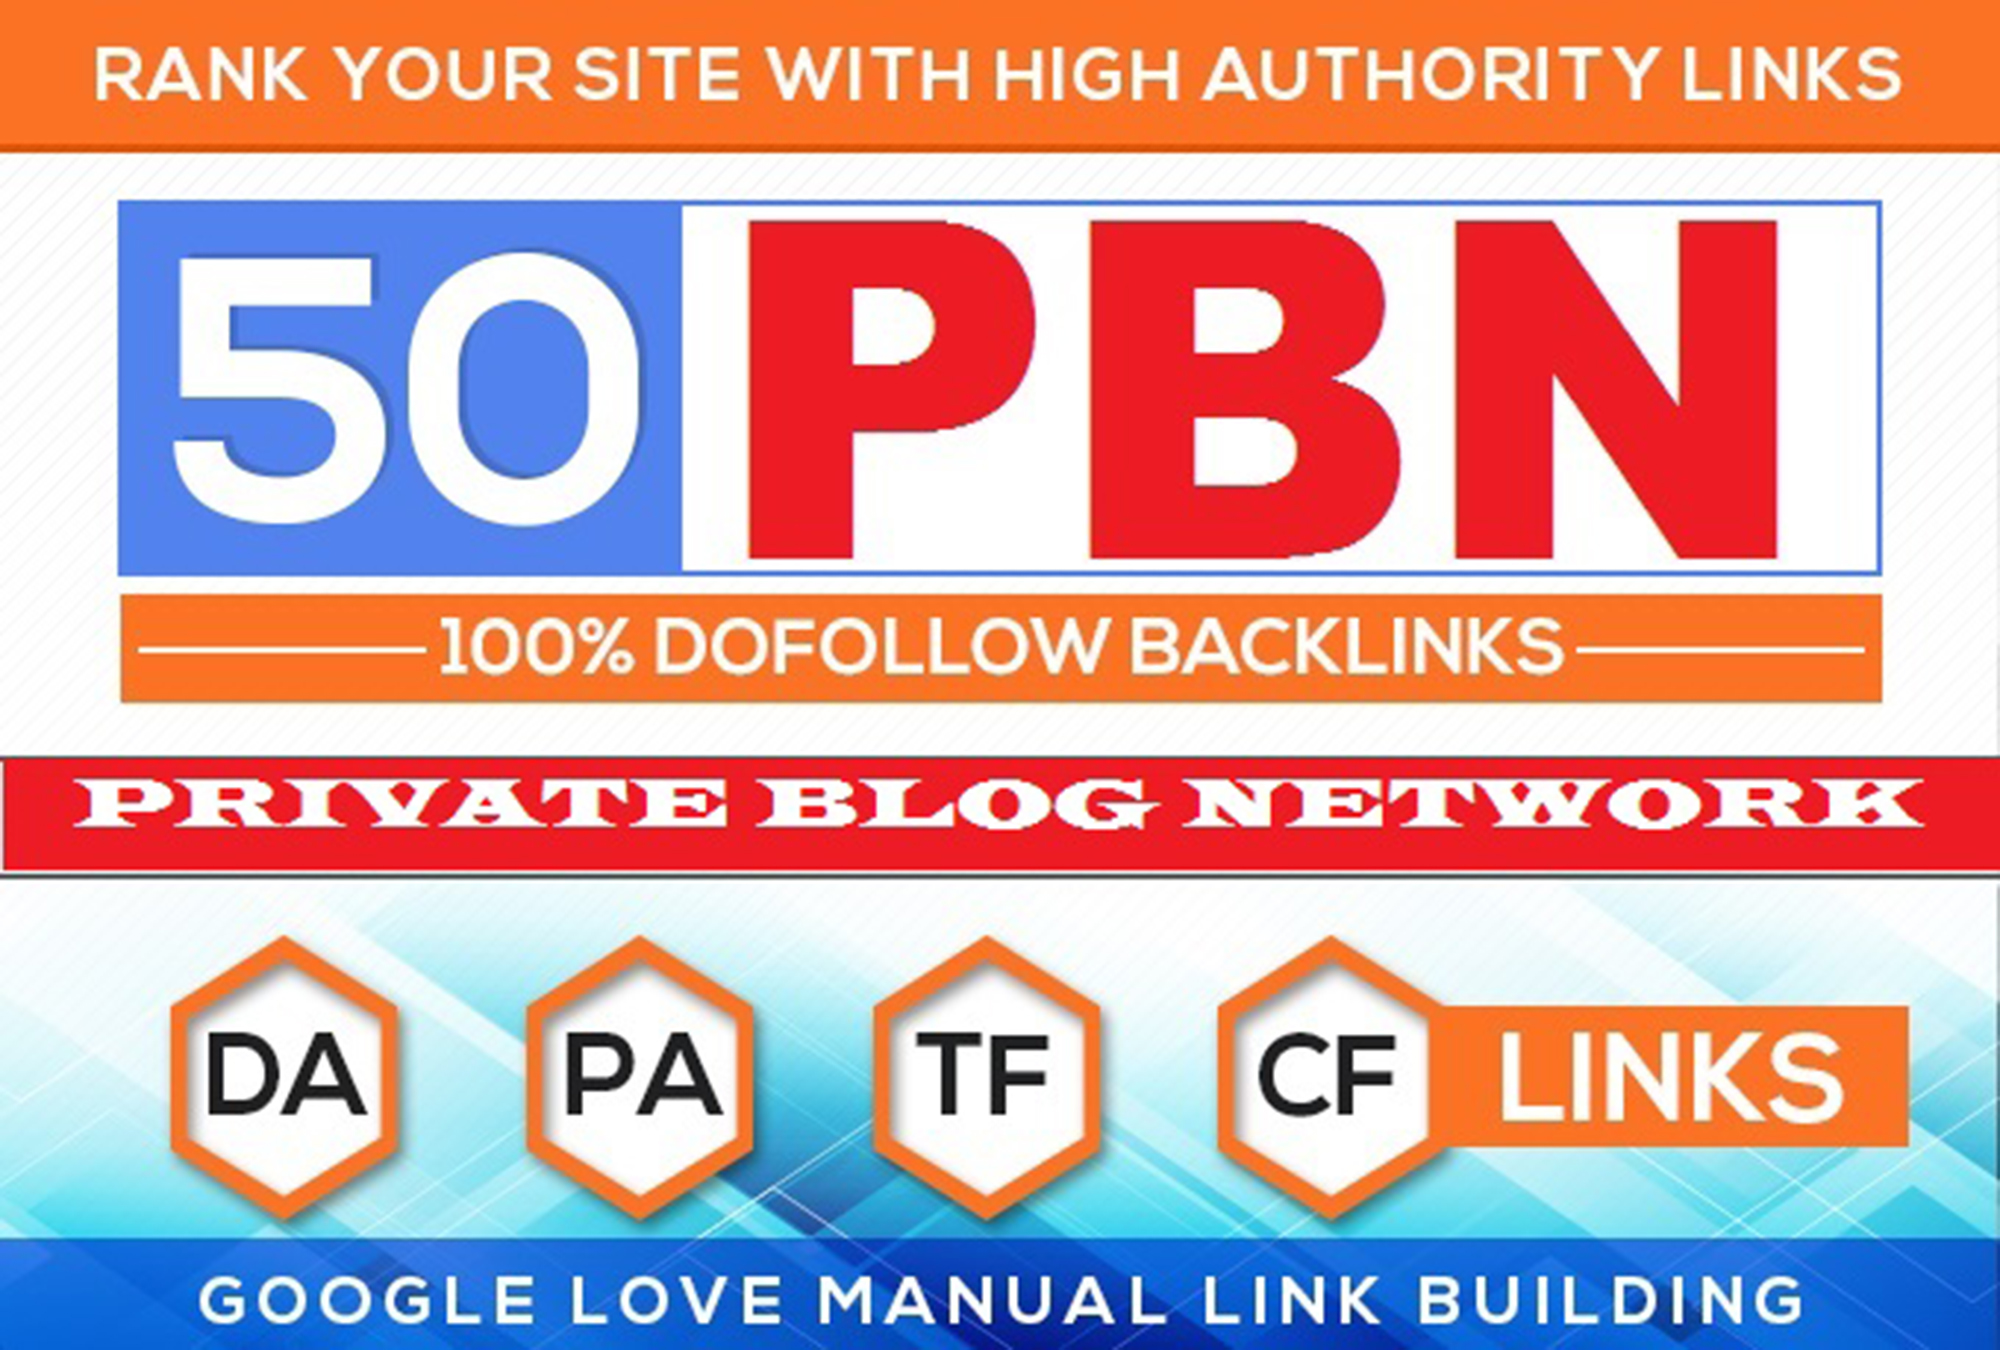 Build 50 High PA DA TF CF HomePage PBN Backlinks - Dofollow Quality Link